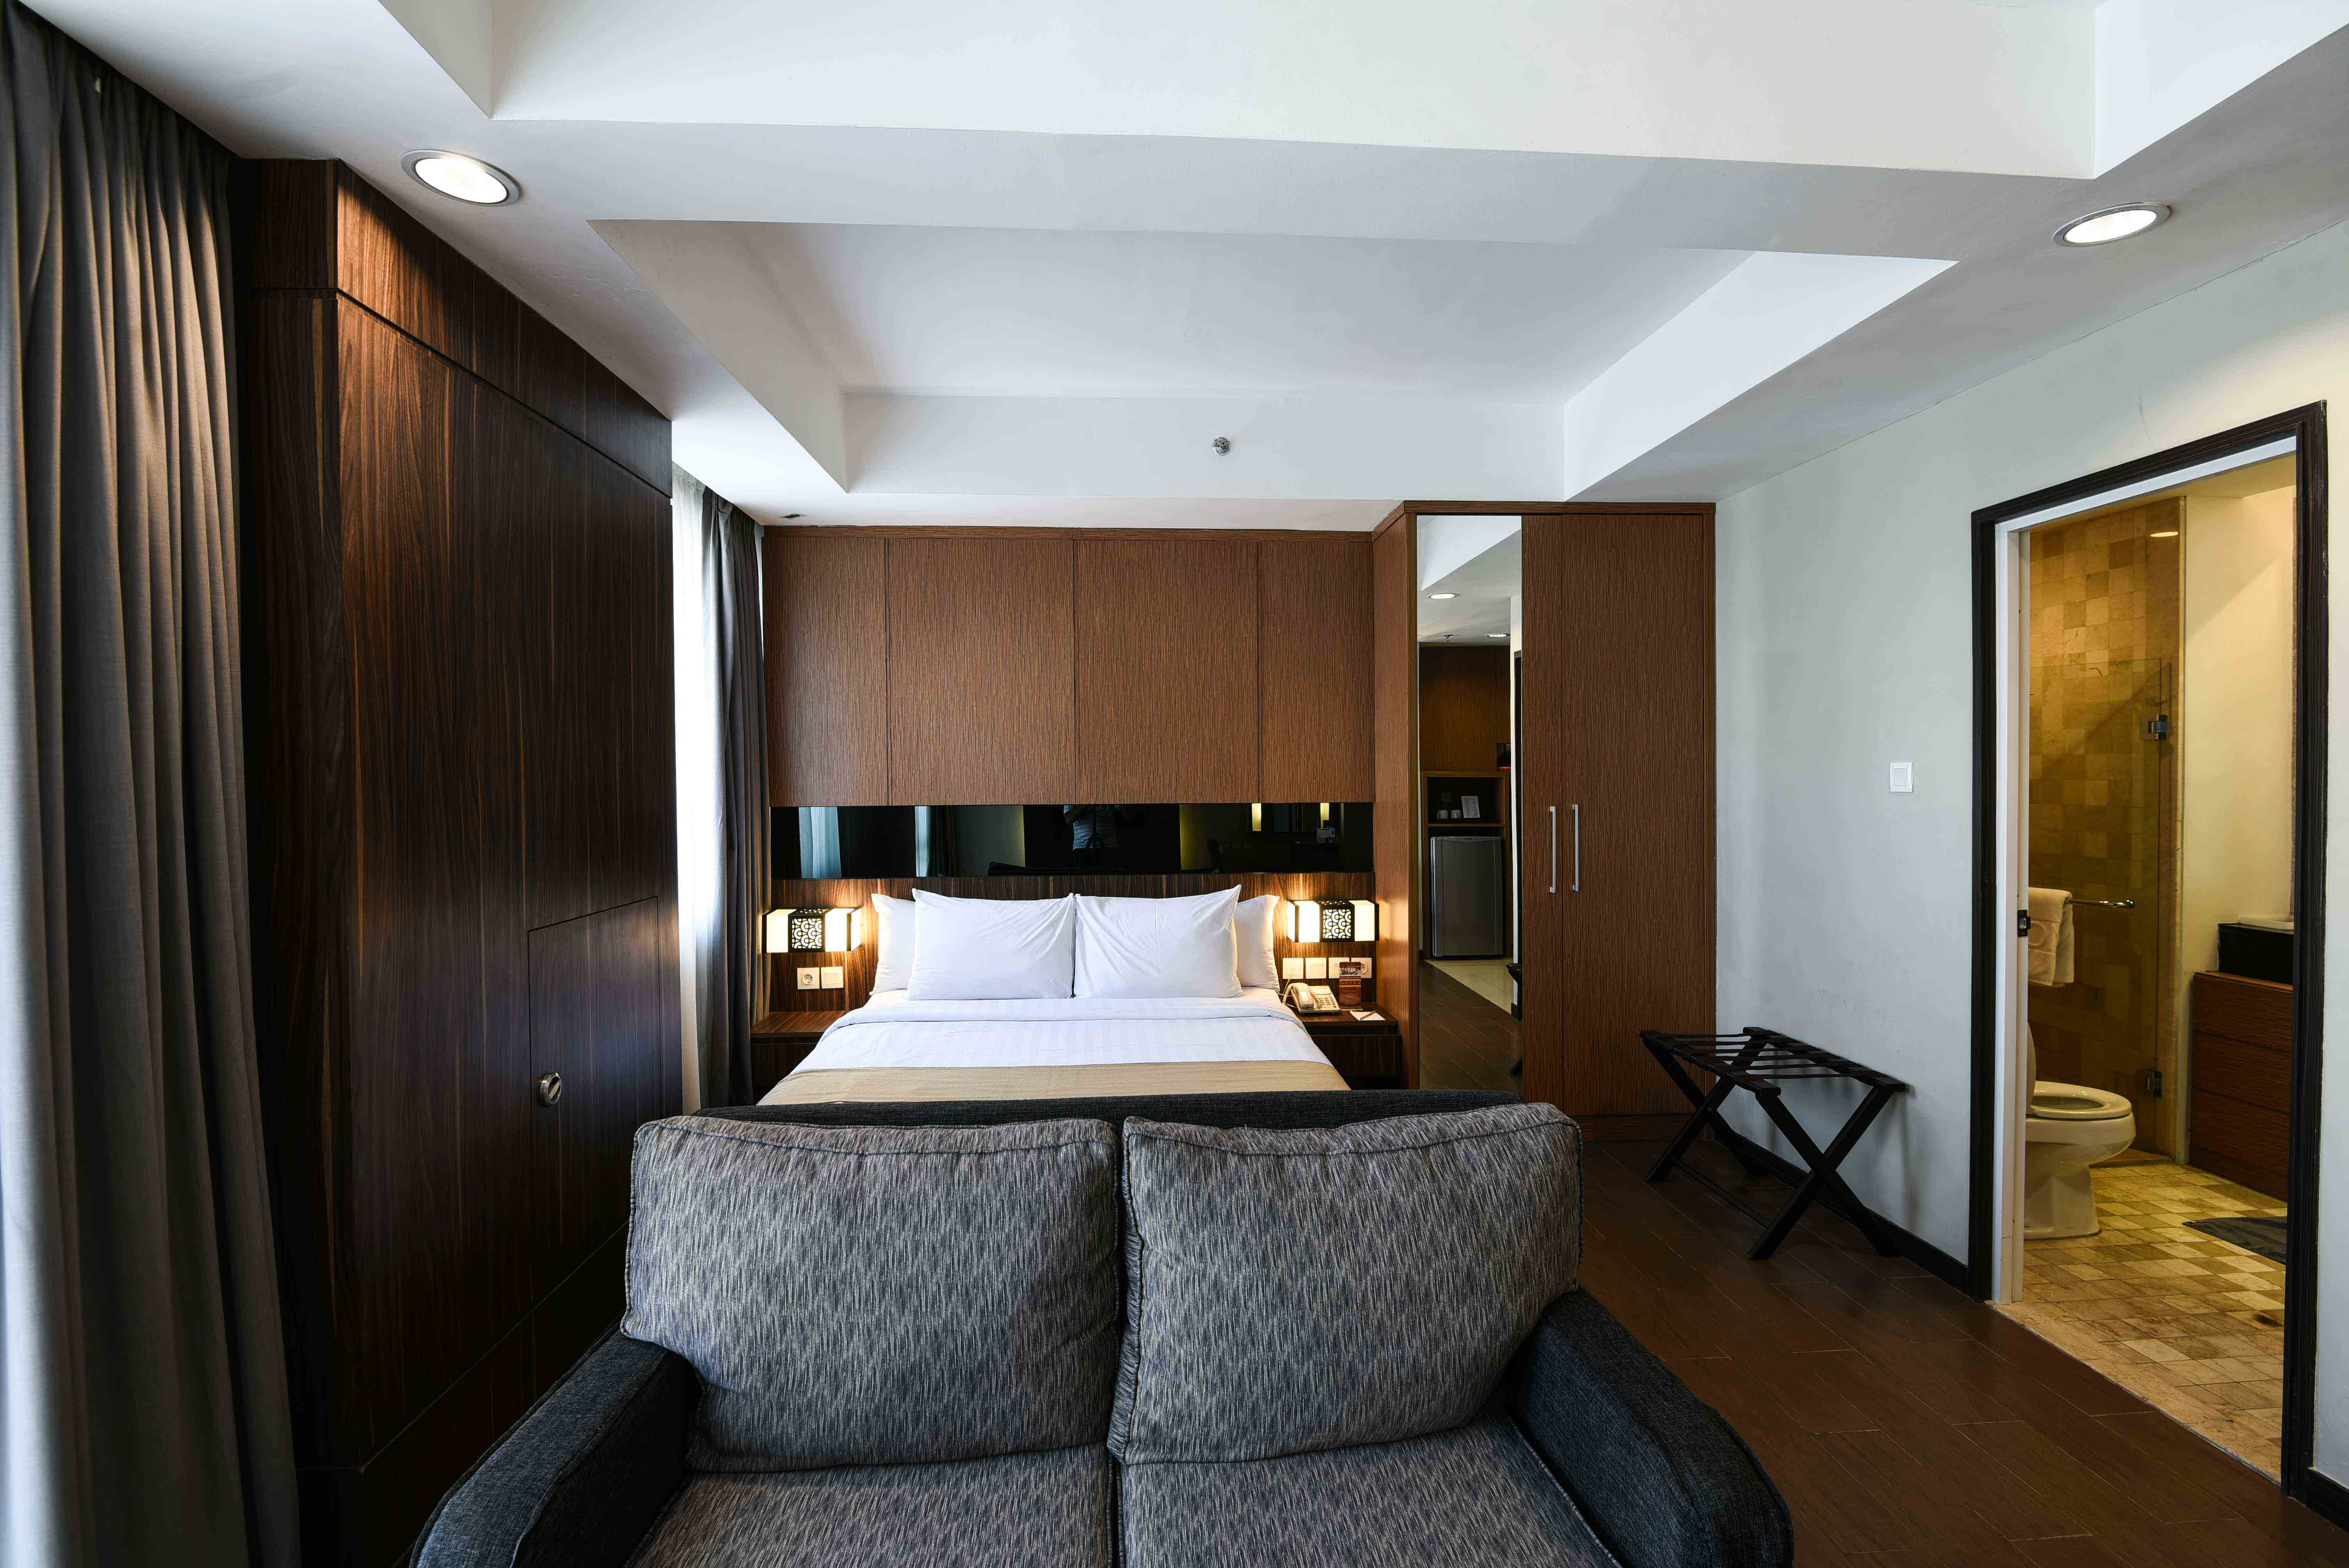 The Malibu Suites By Sissae Living Balikpapan